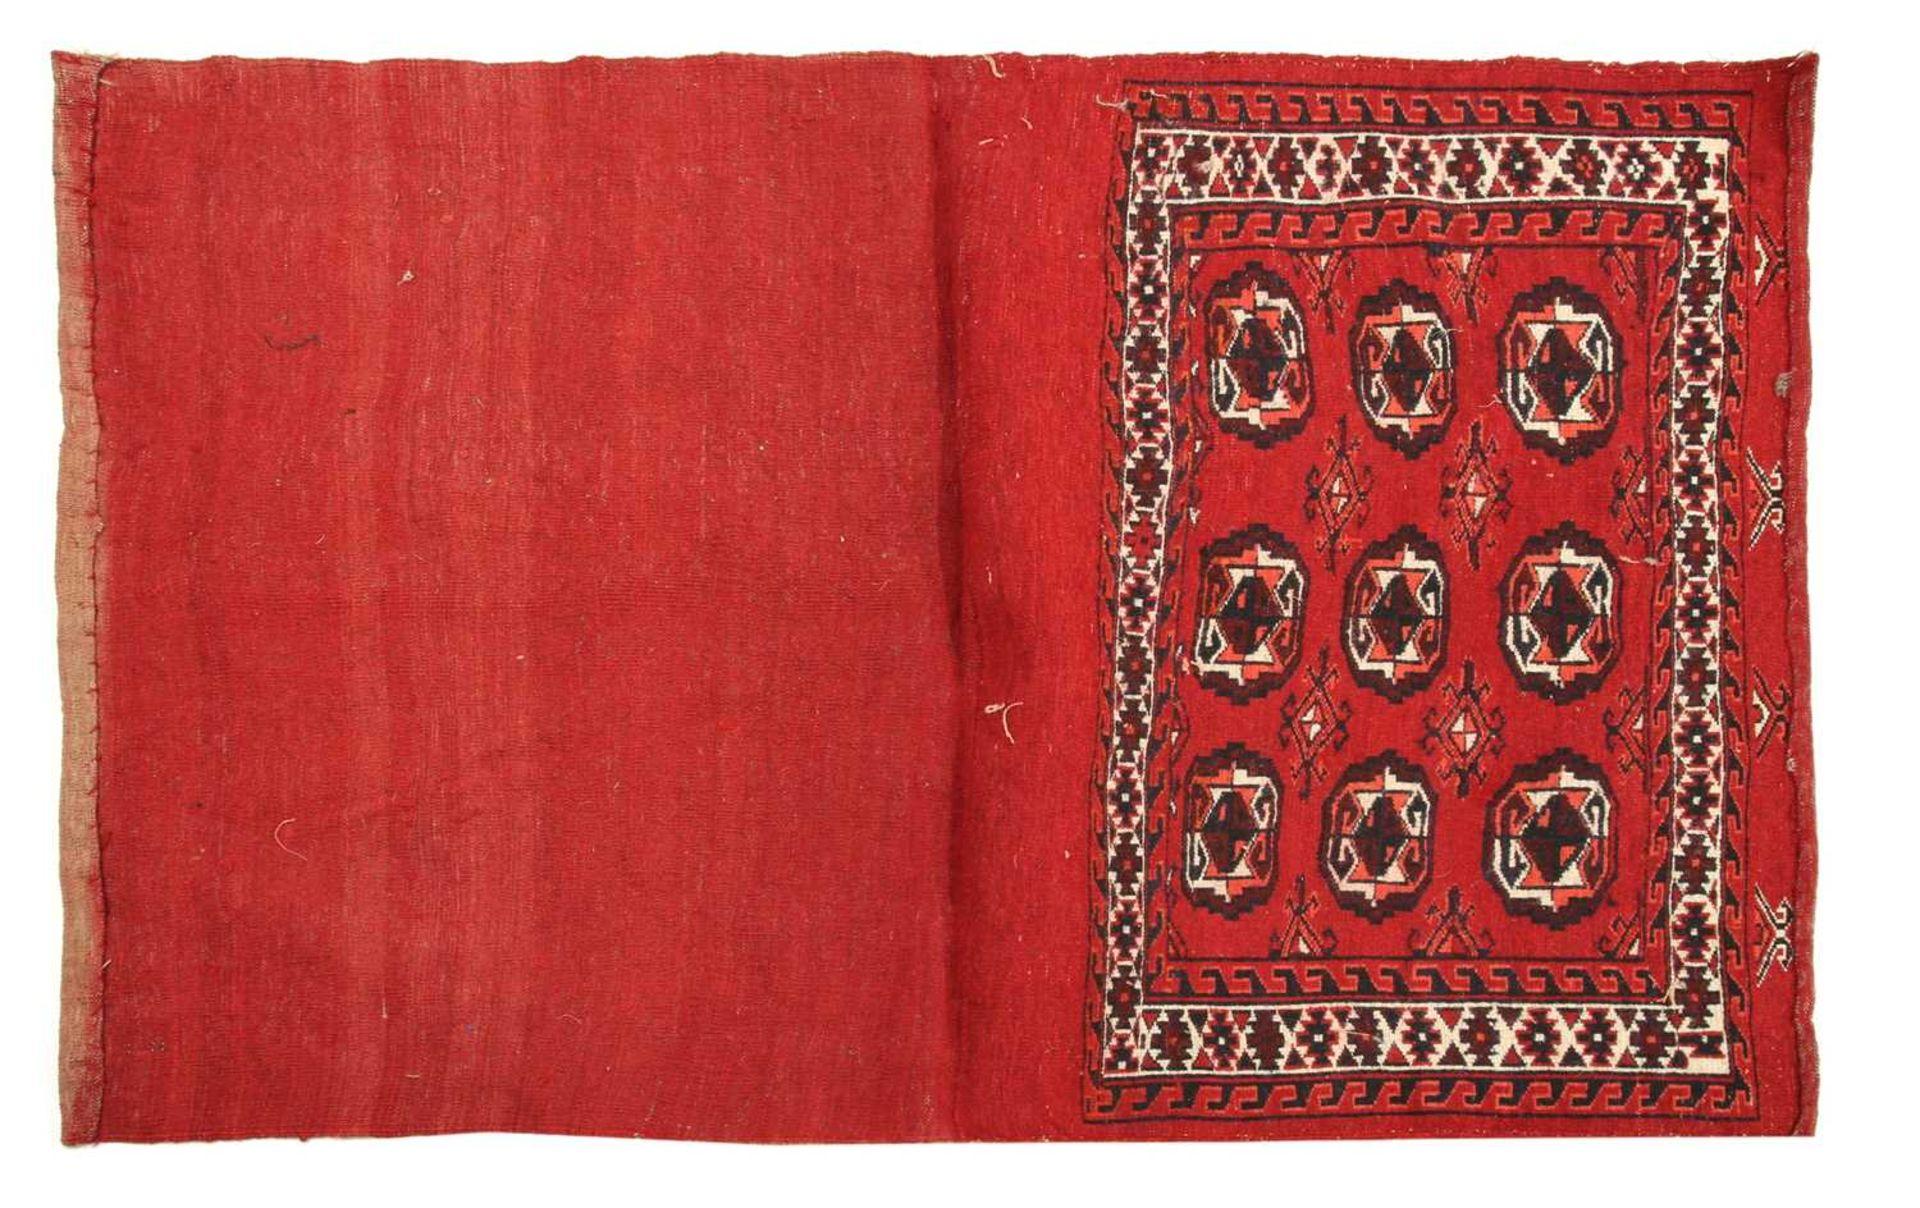 Two Persian bags,